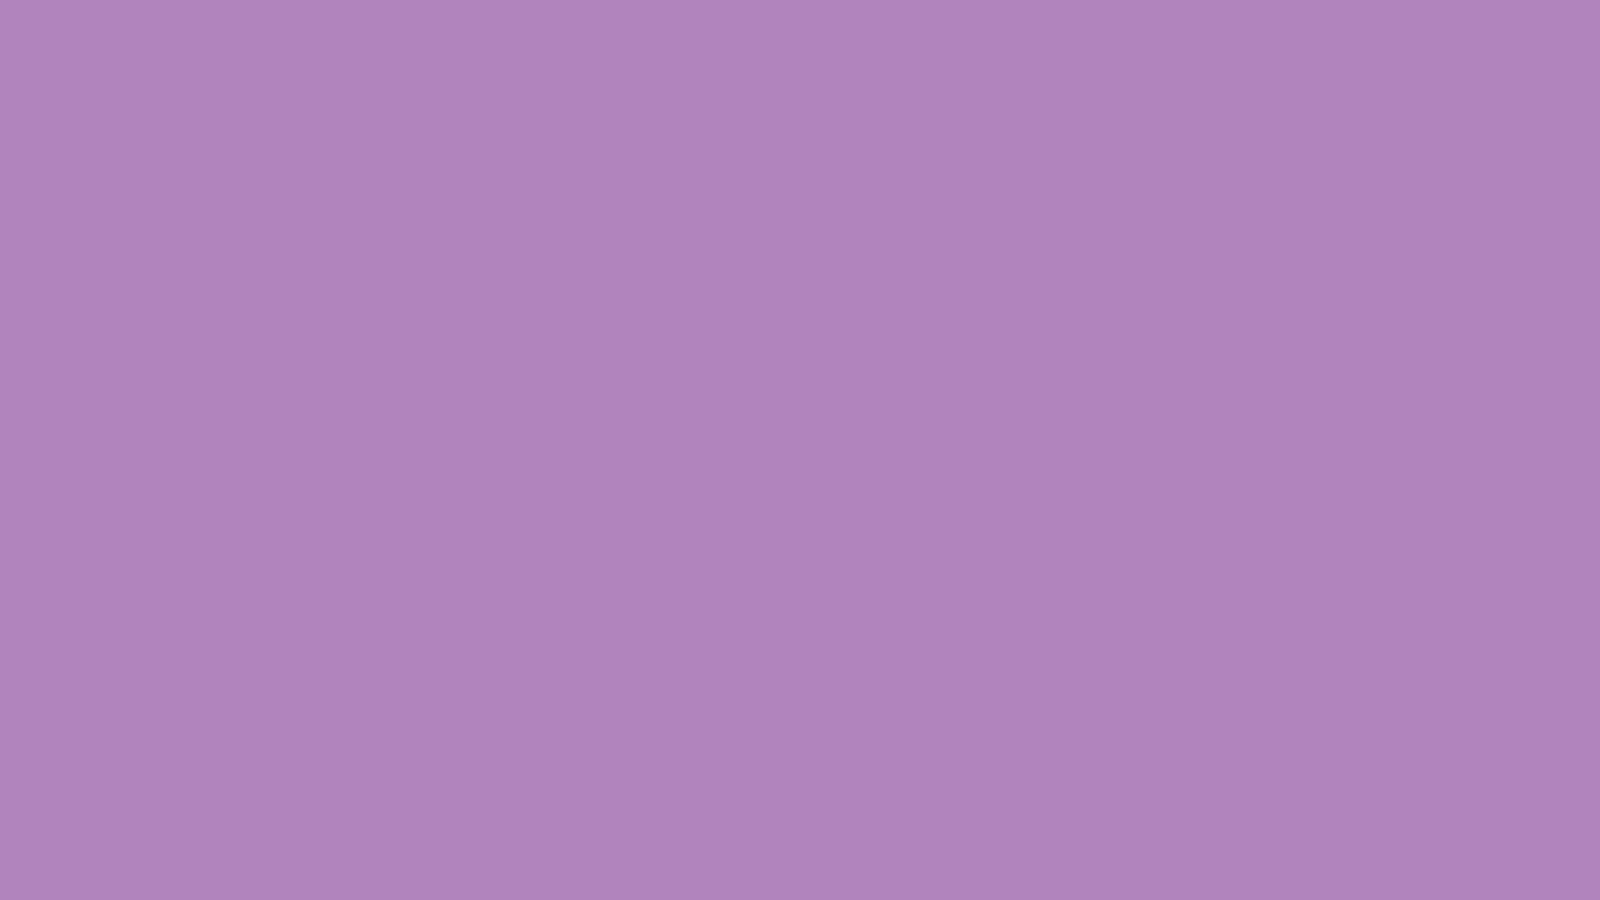 1600x900 African Violet Solid Color Background